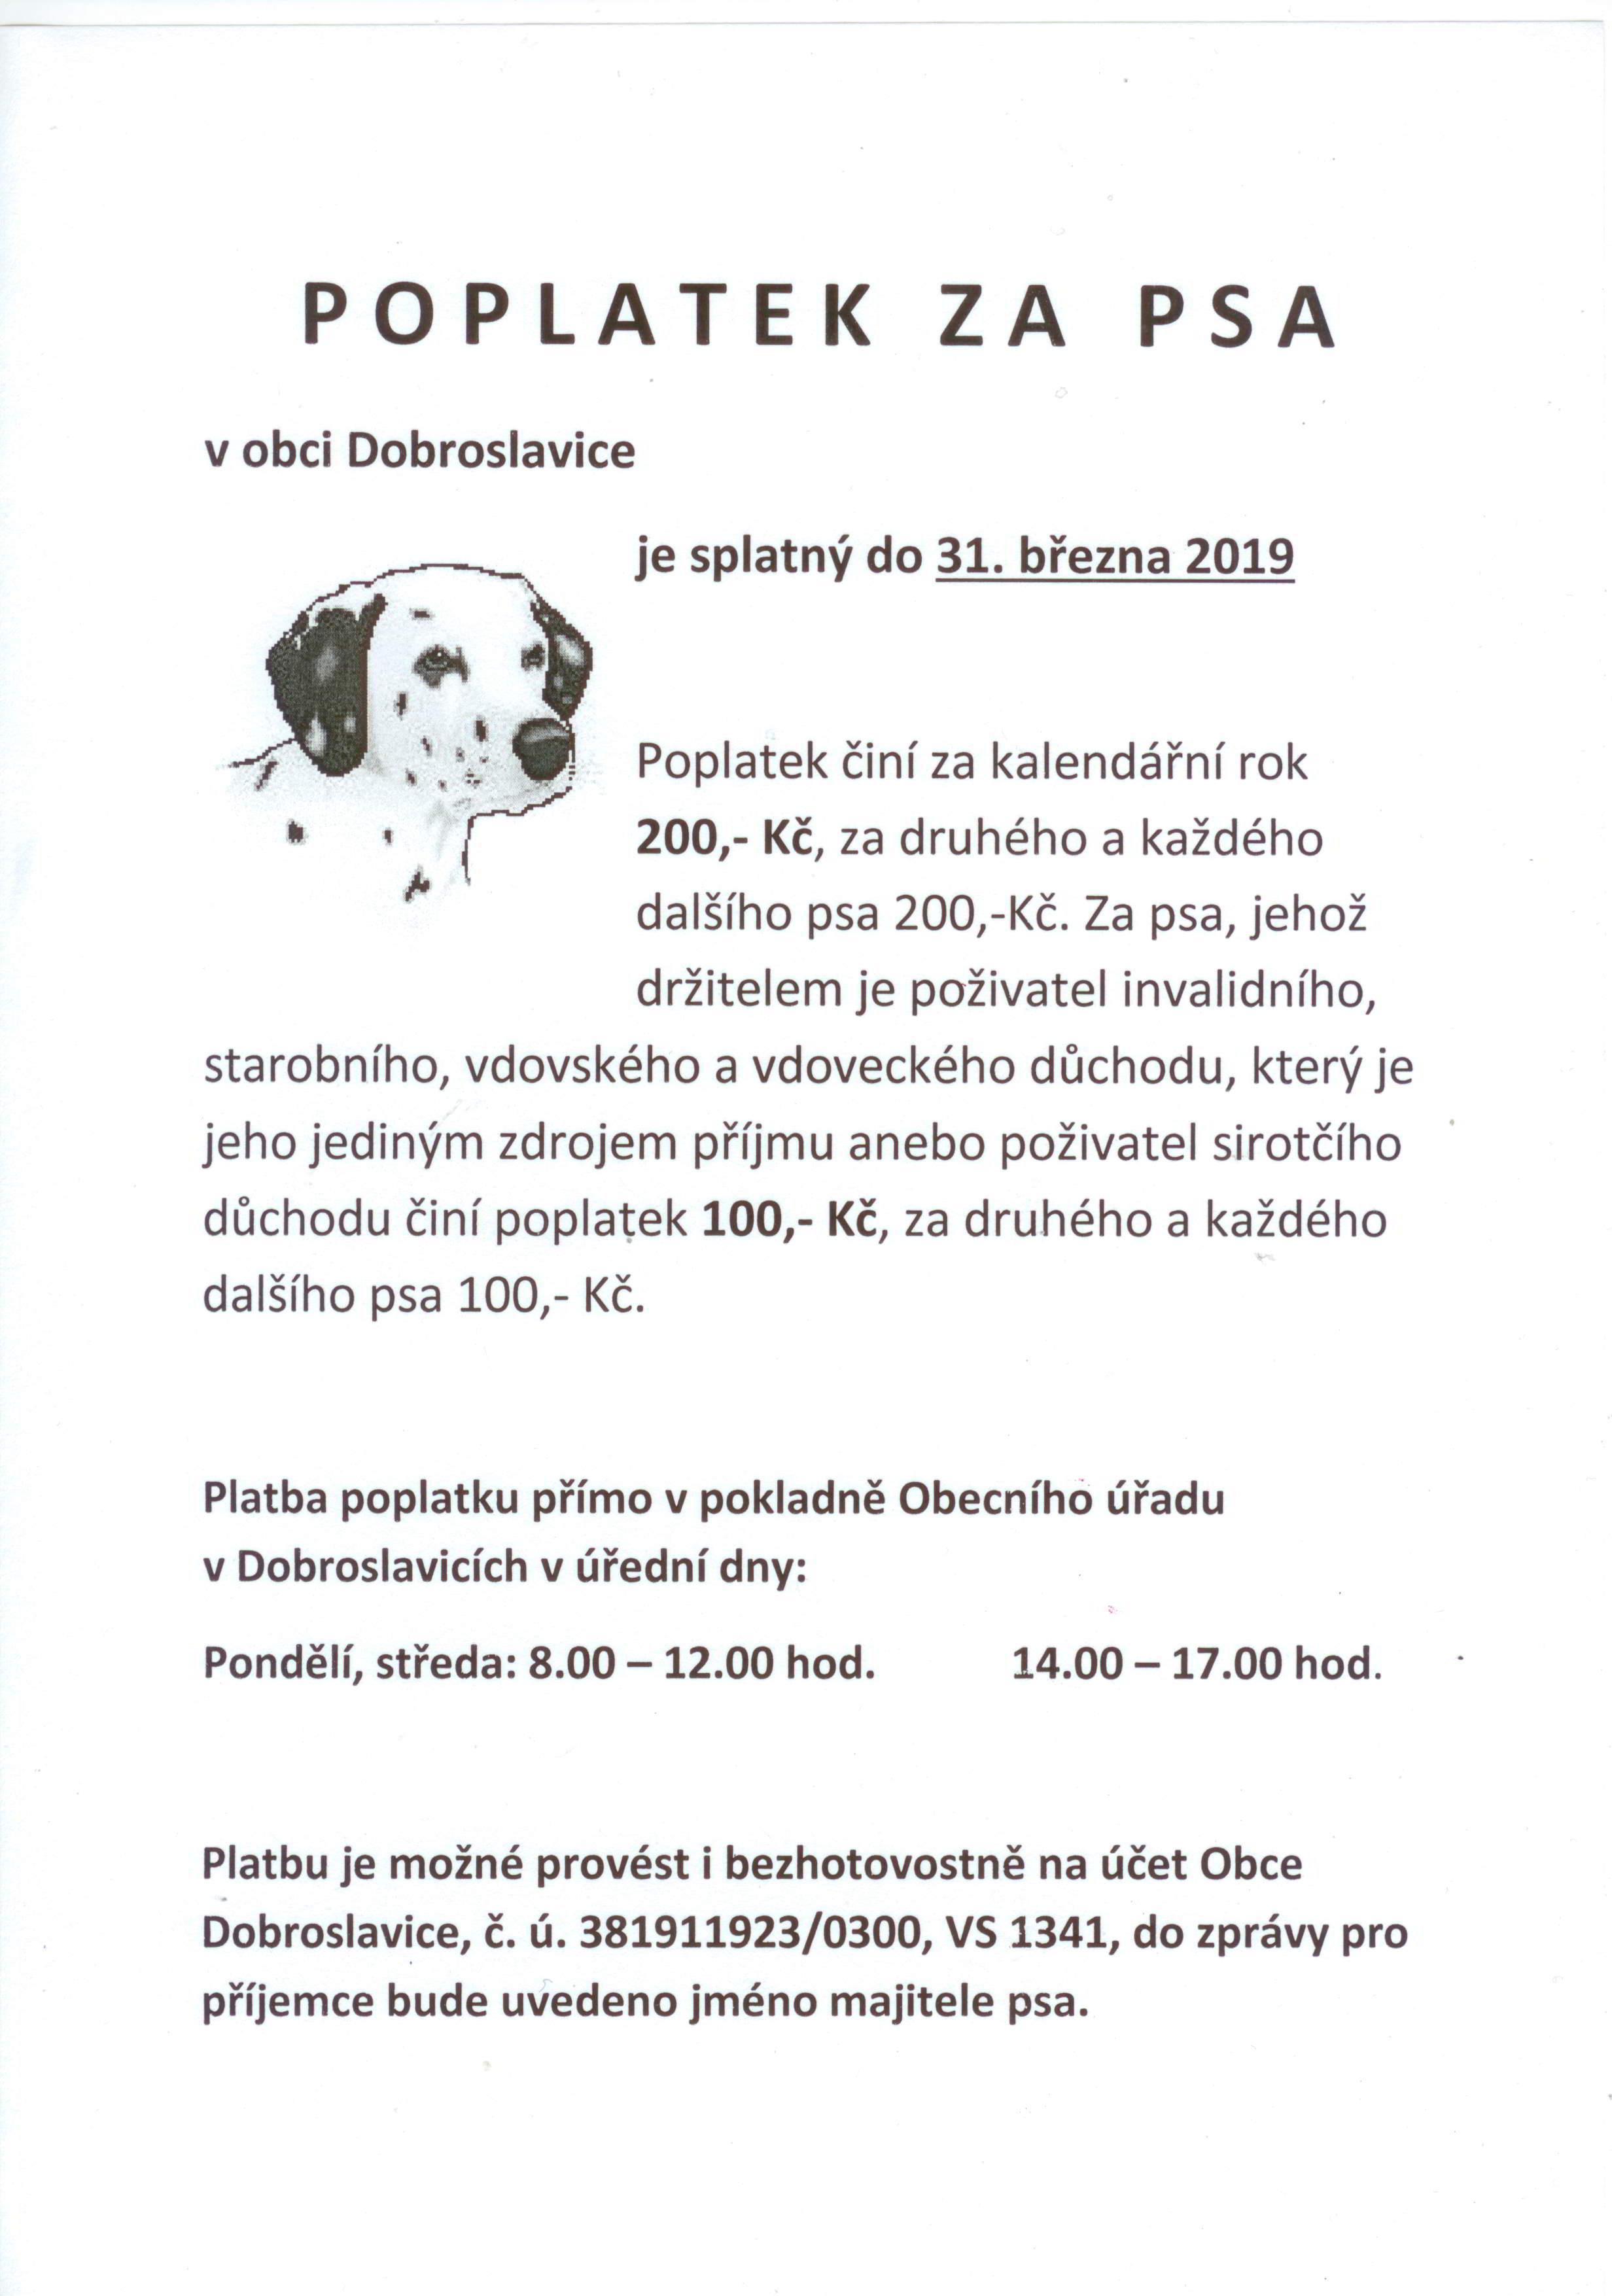 poplatek za psa 2019